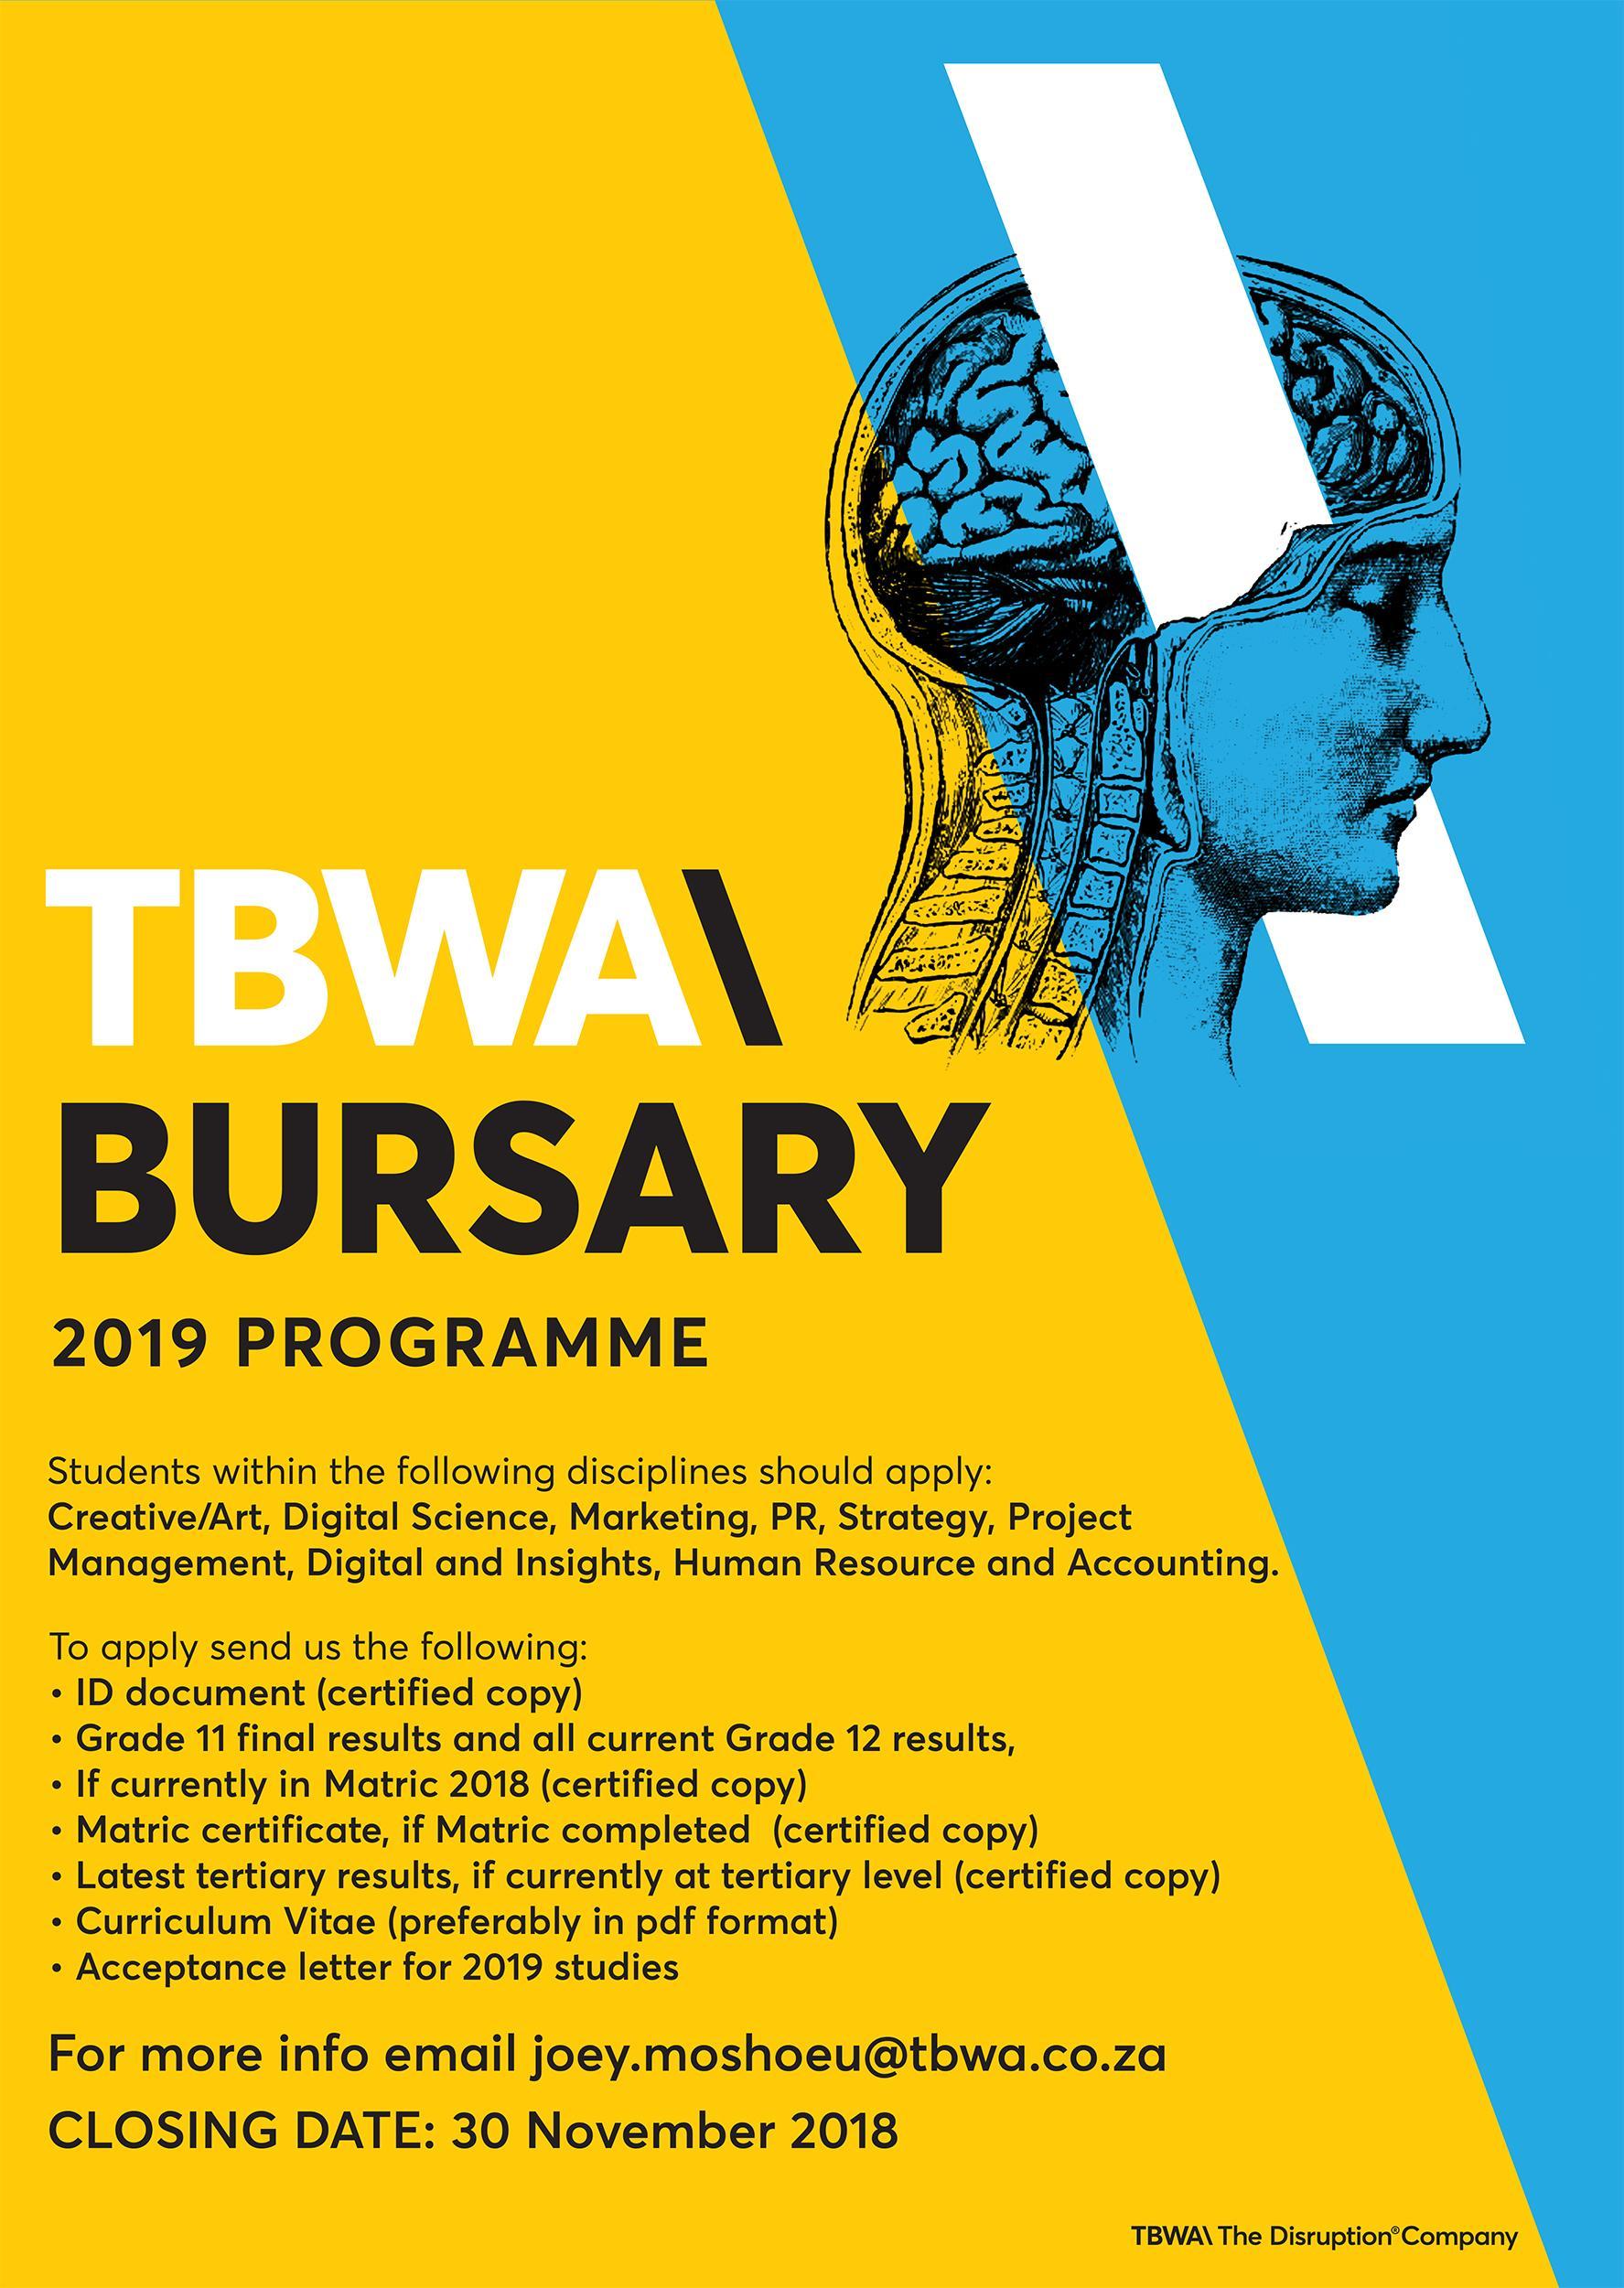 TBWABursary2019